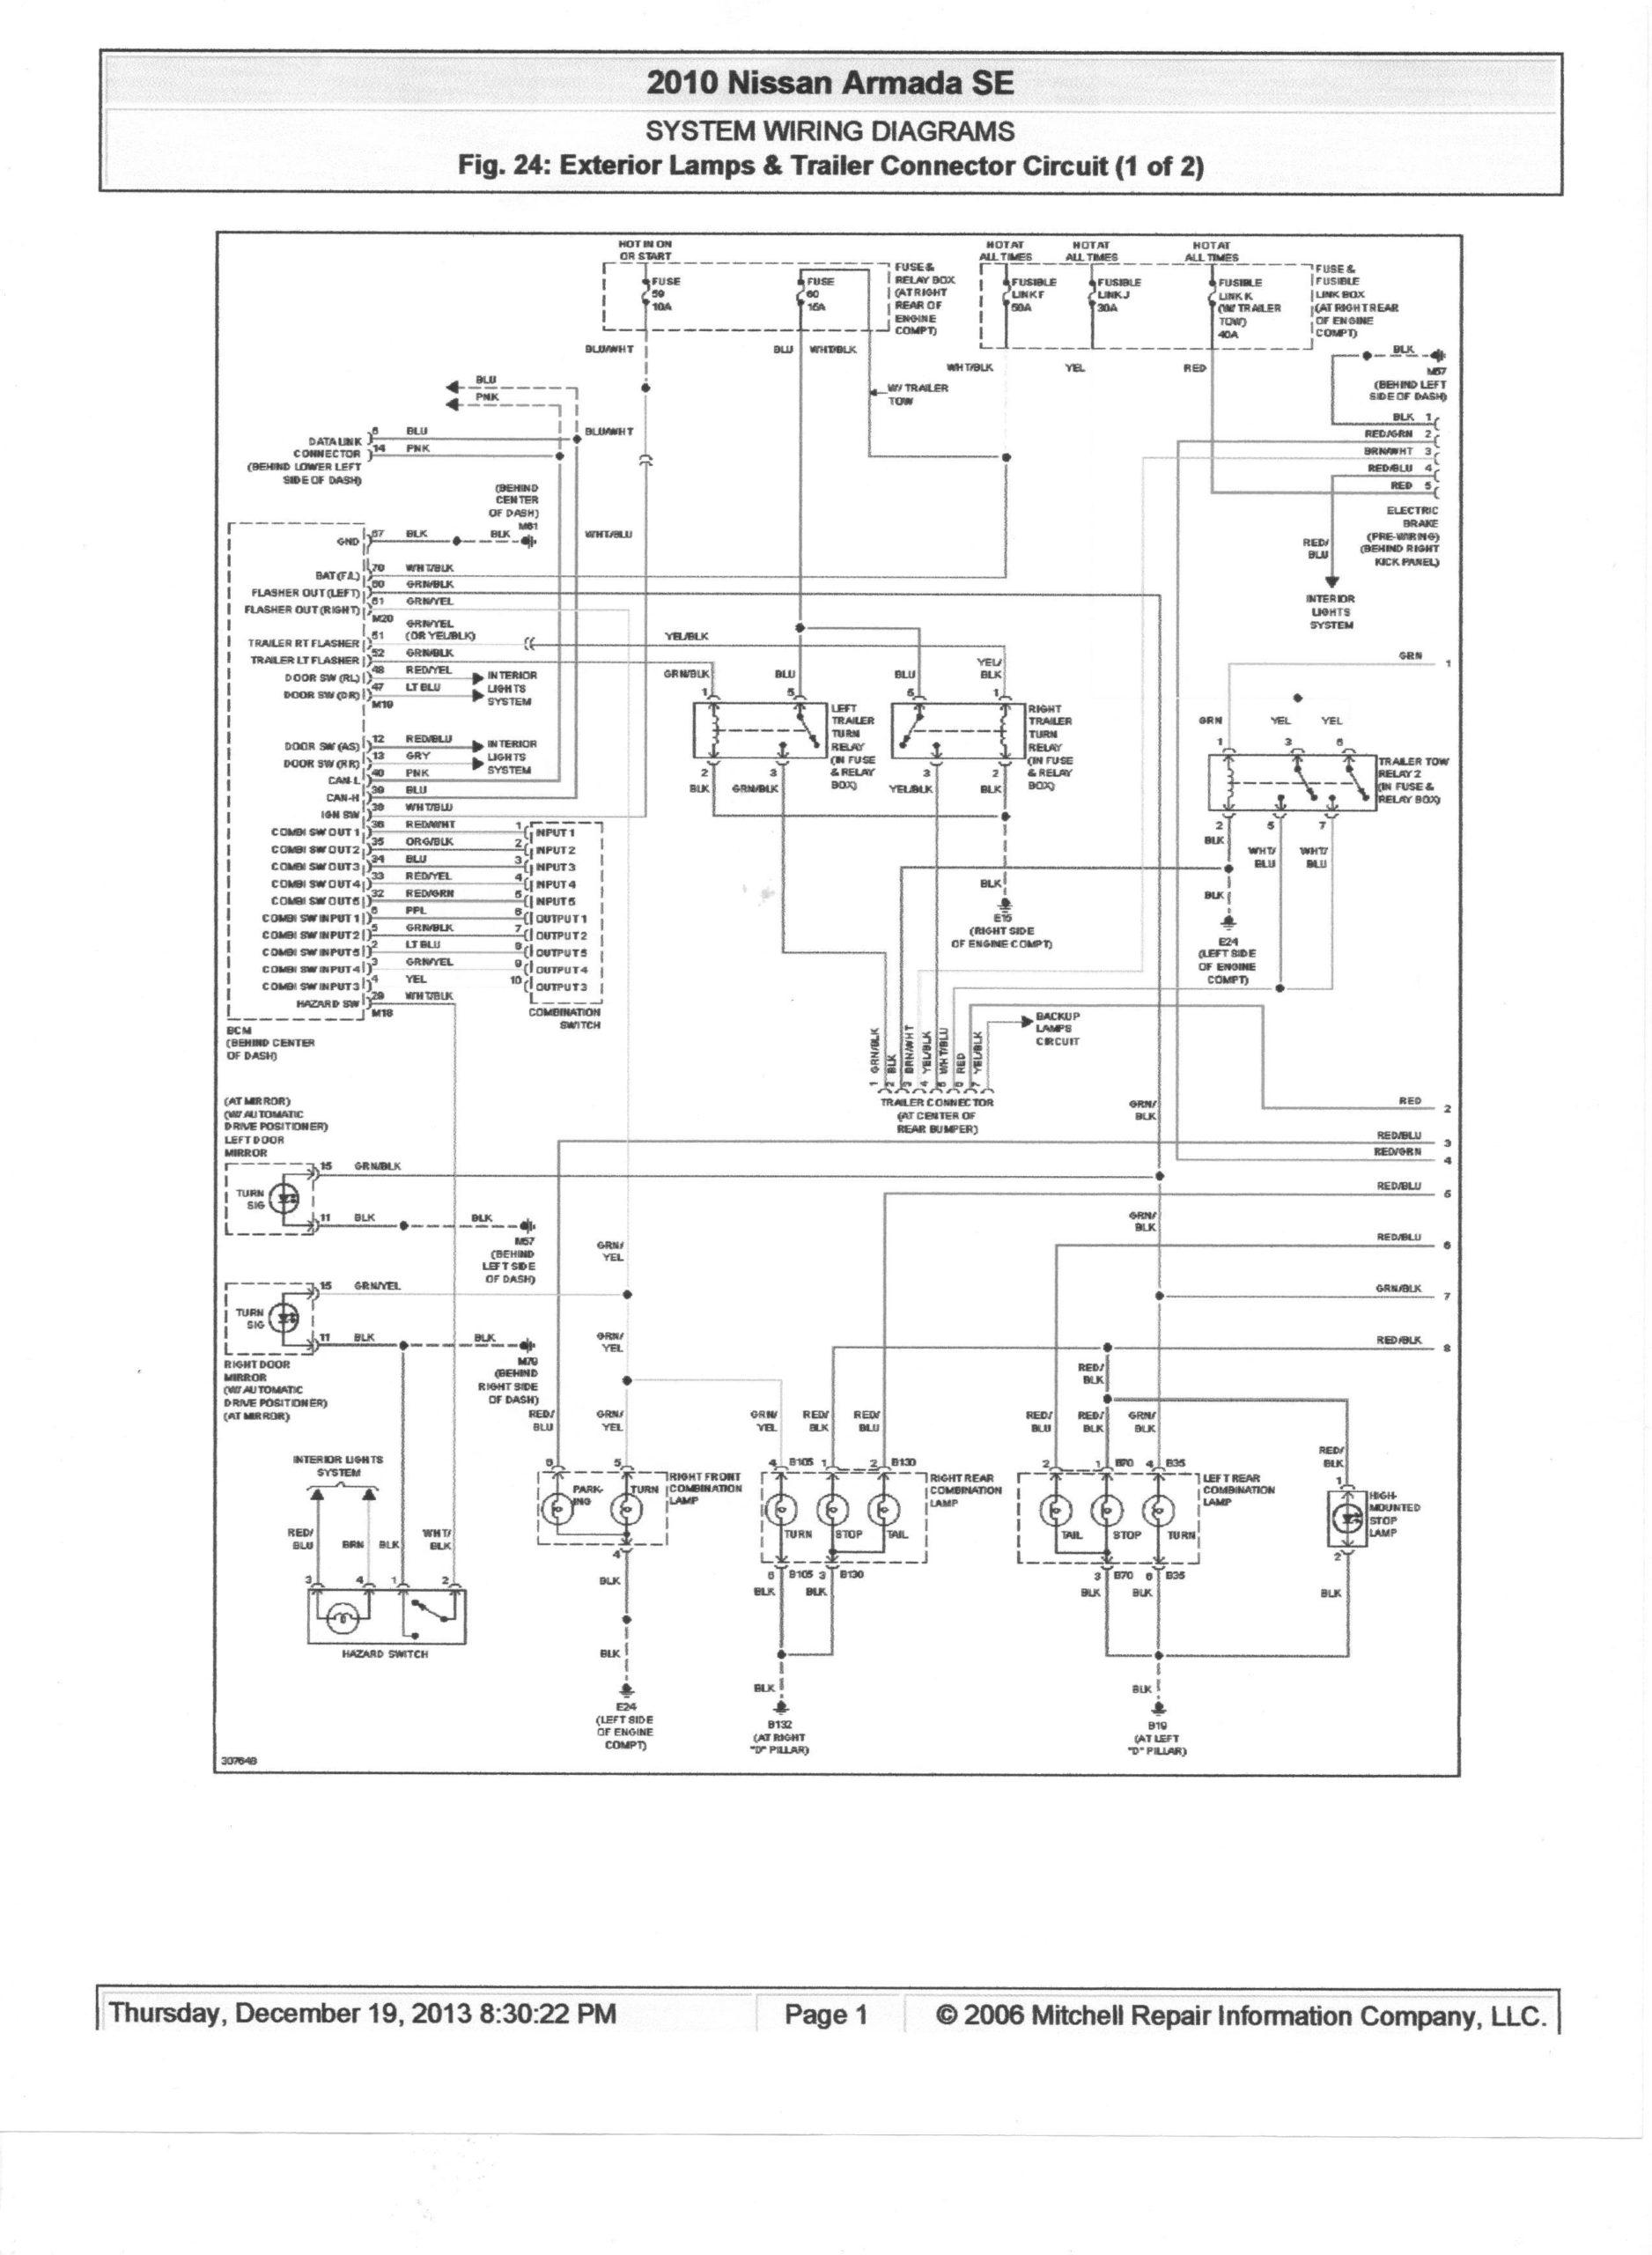 2006 Nissan Titan Trailer Wiring Diagram